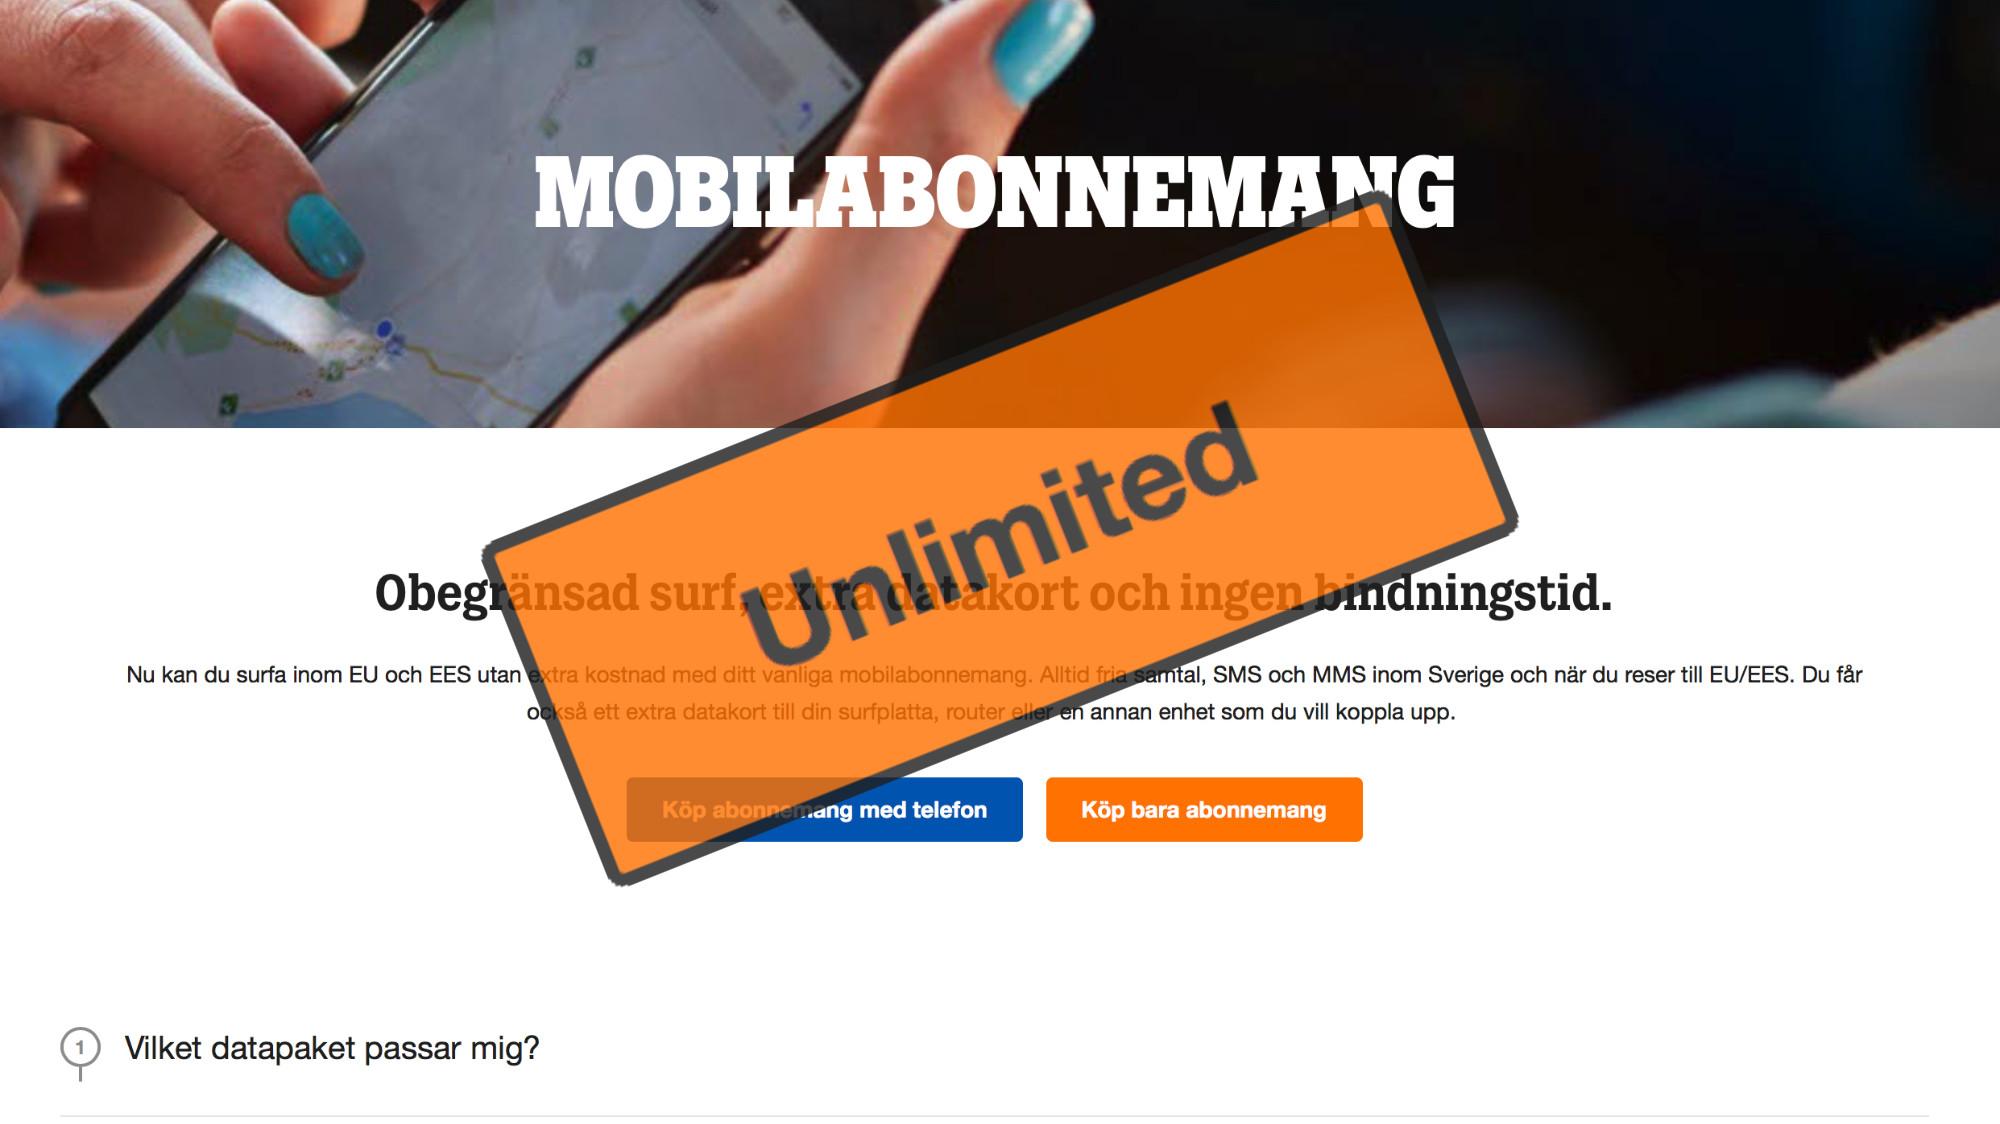 mobilabonnemang utan surf